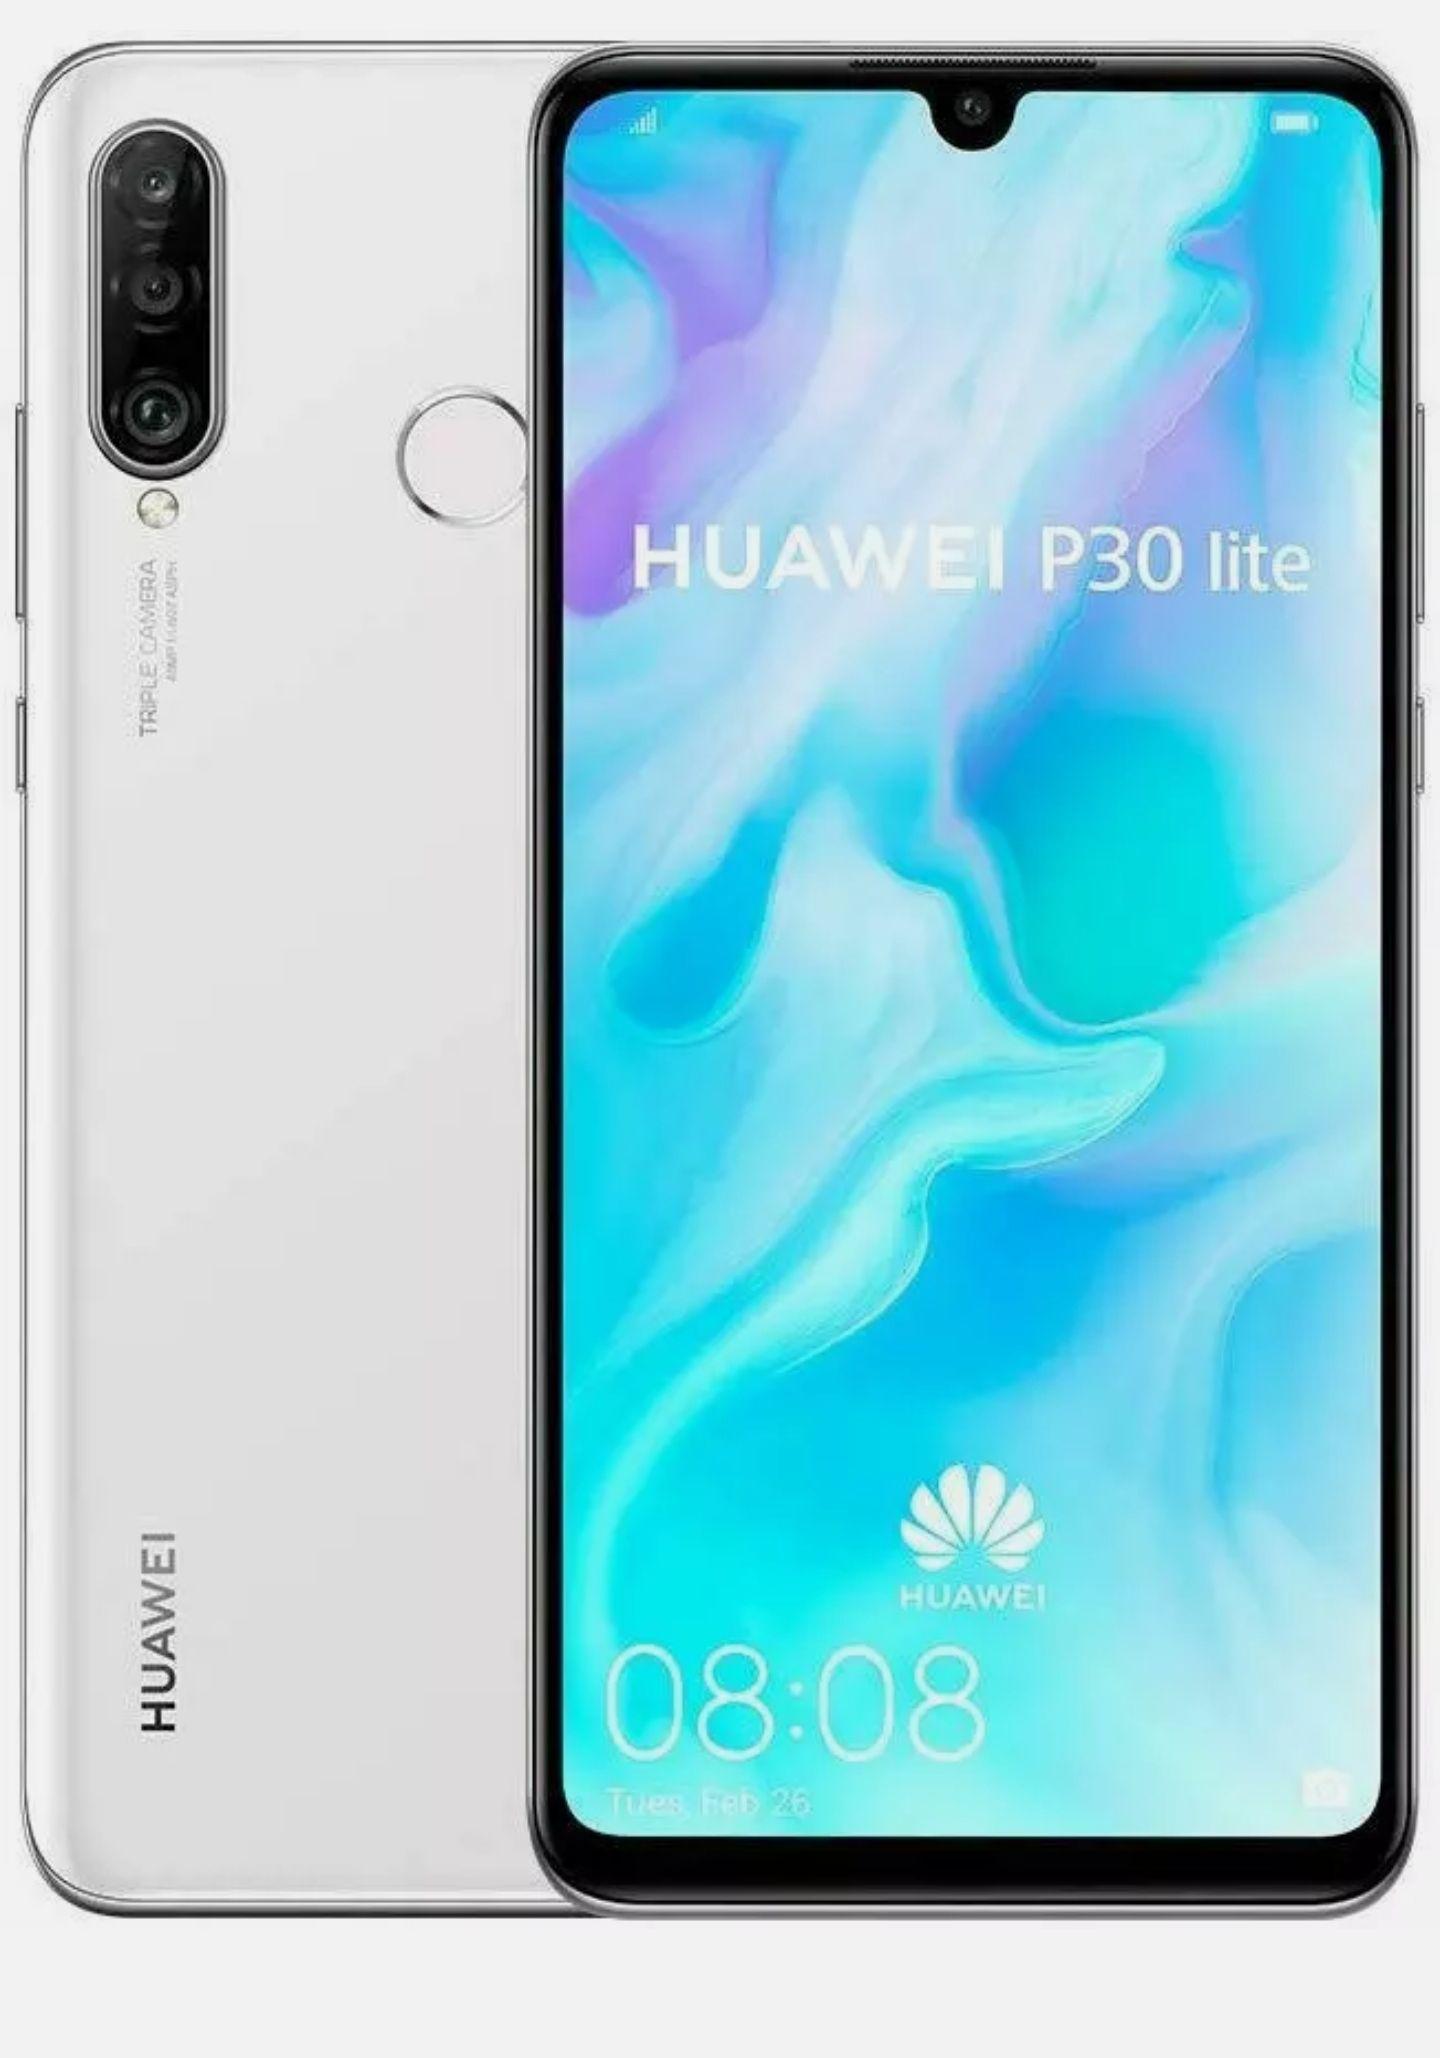 Huawei P30 Lite 128GB Smartphone - £128.24 Refurbished (Like New) With Code @ Argos On Ebay (UK Mainland only)